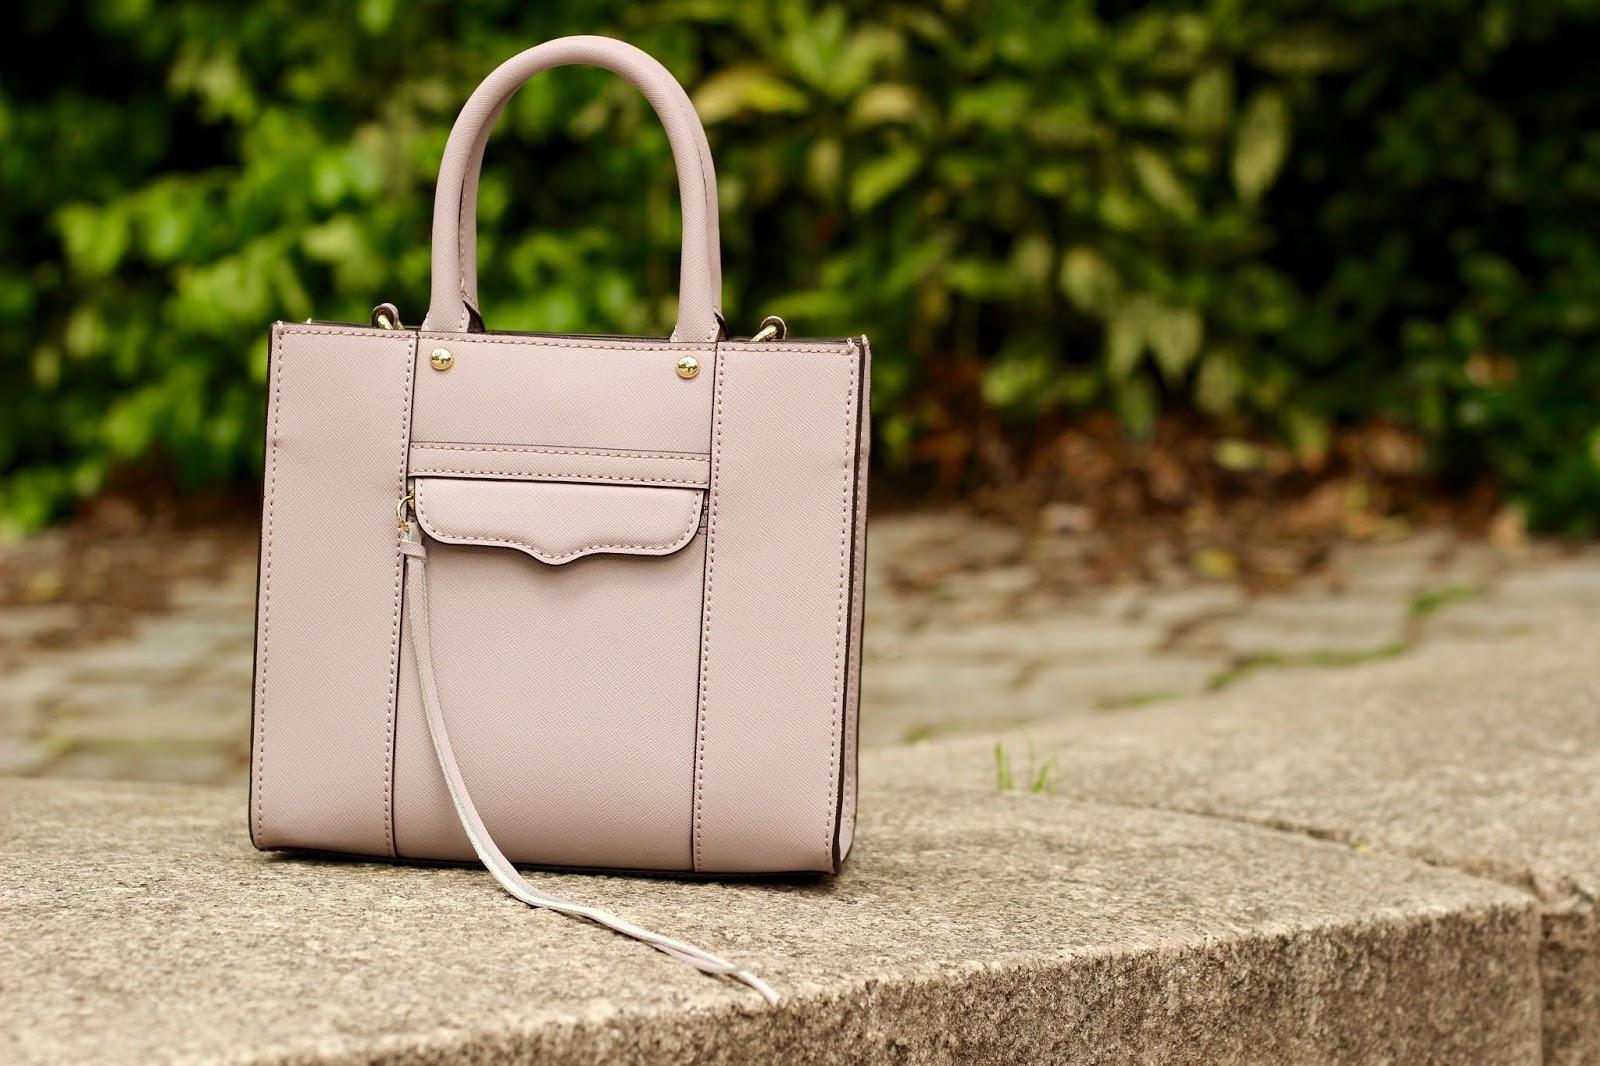 rebecca minkoff miniture bag